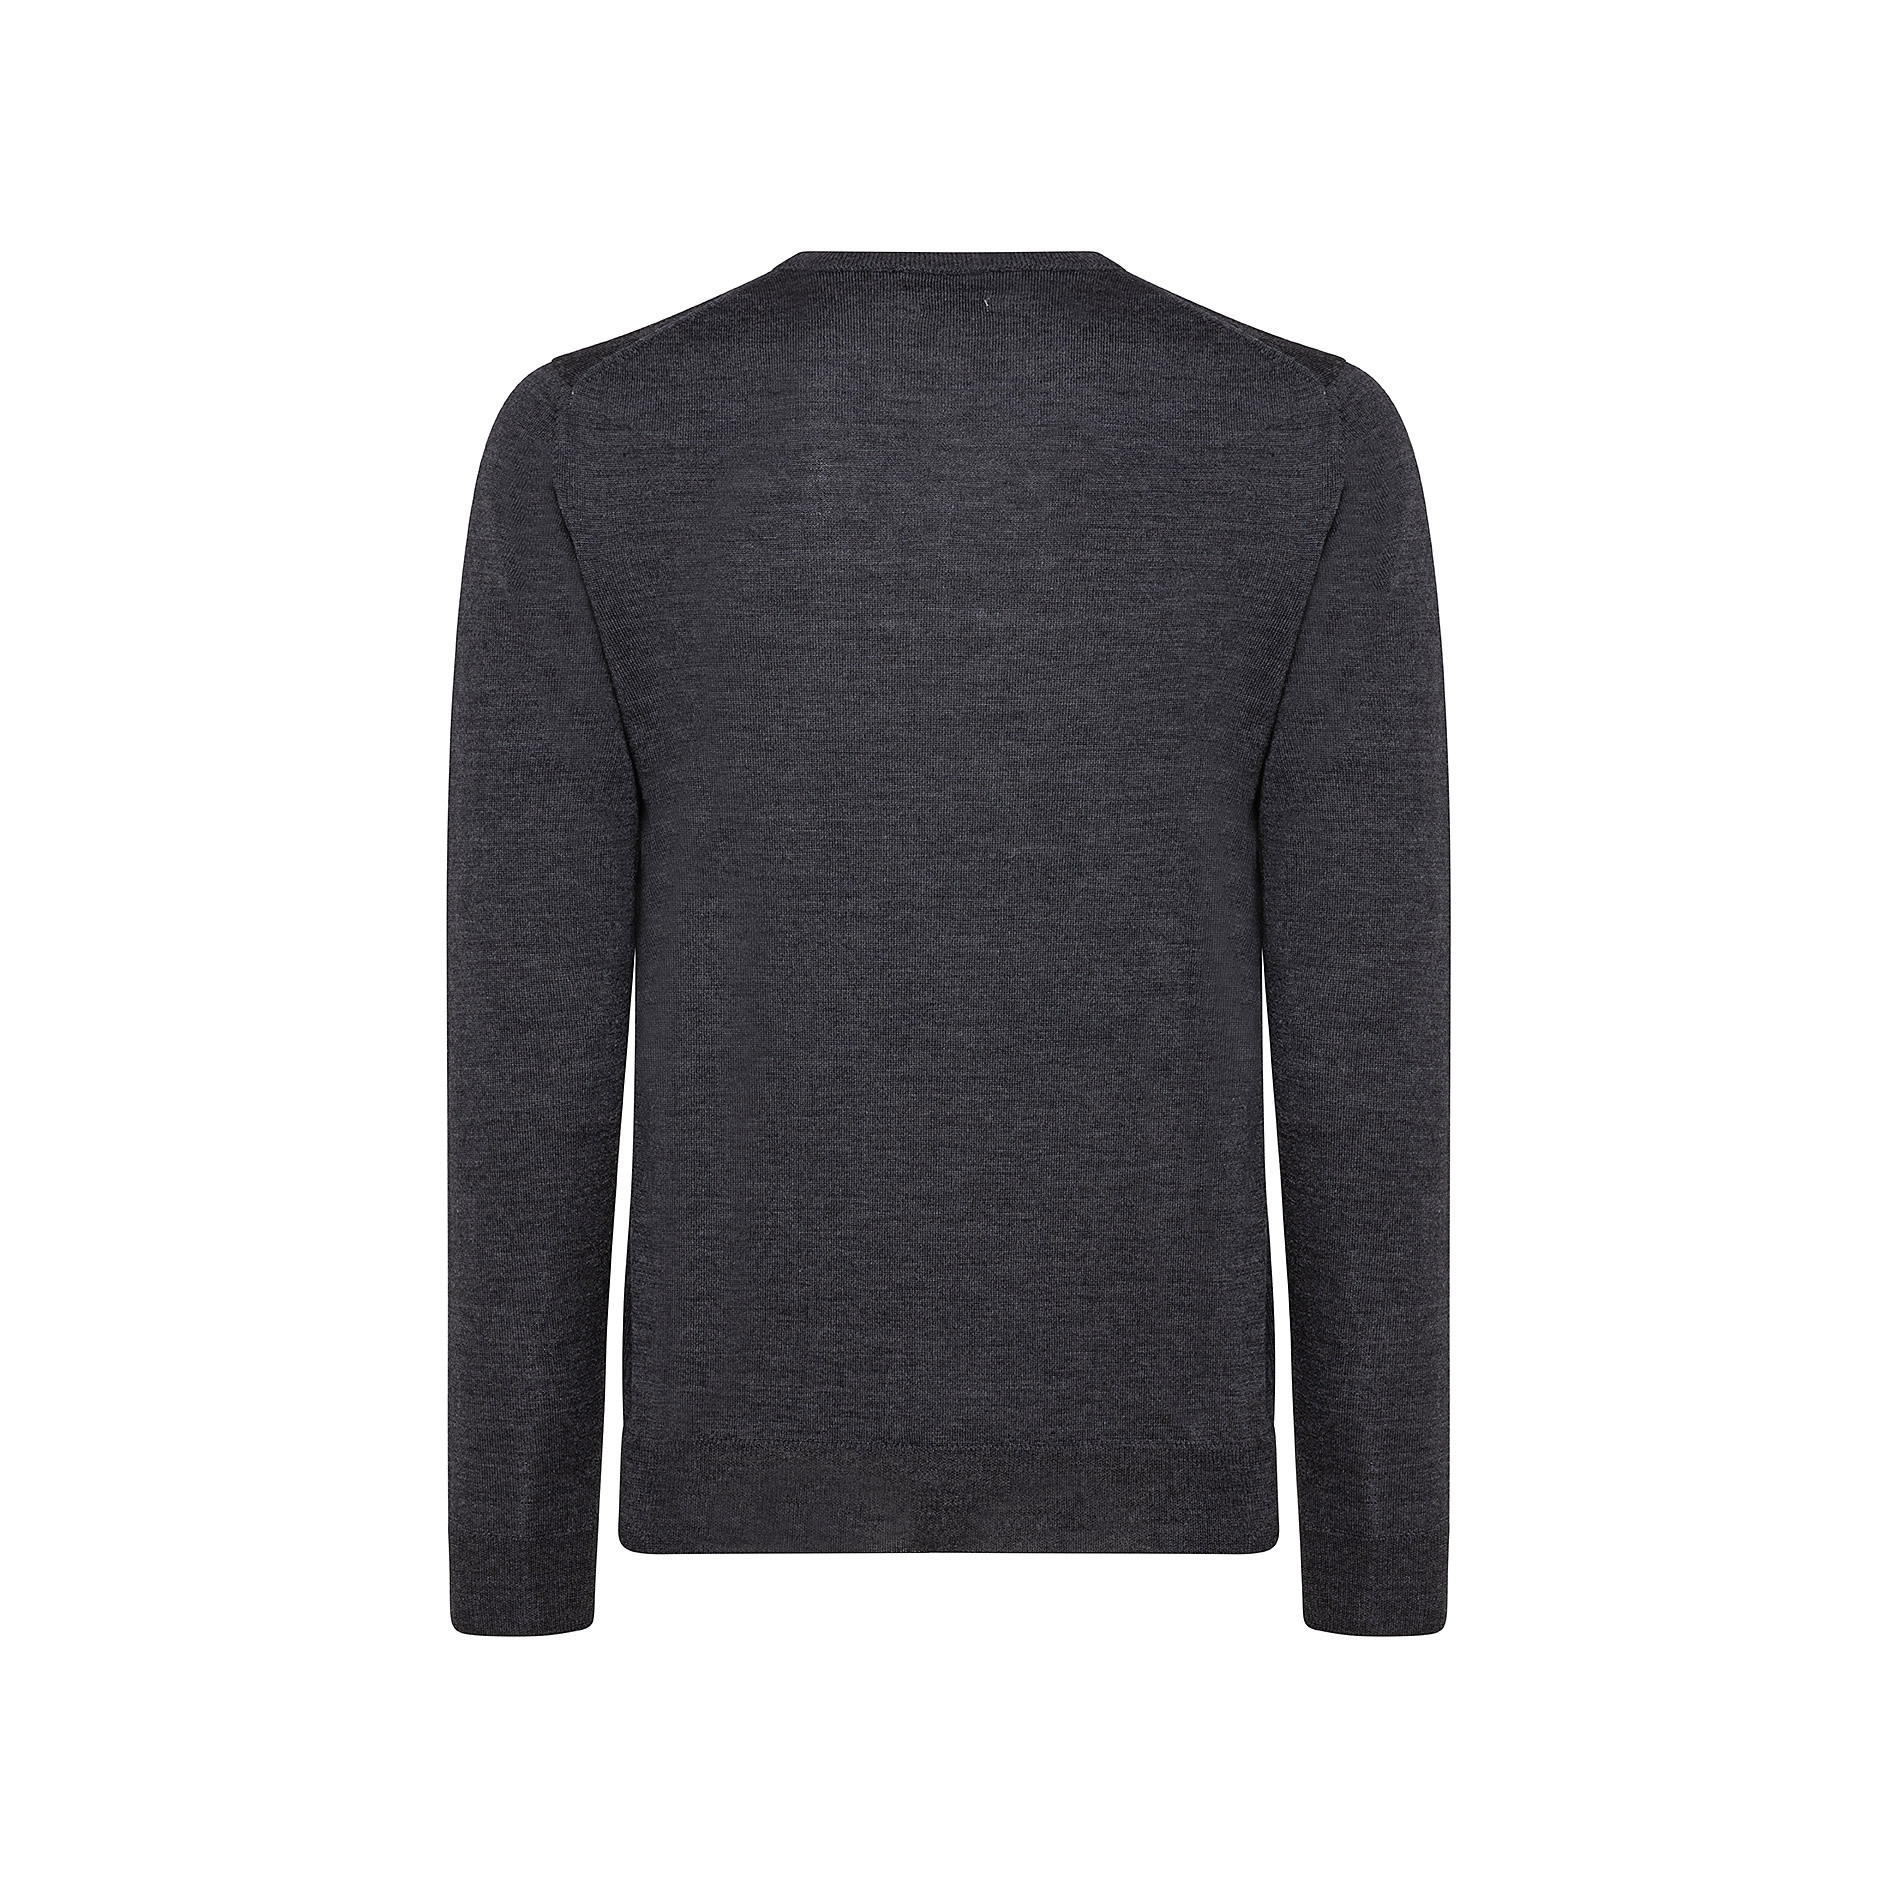 Pullover lana merinos extrafine scollo a V, Grigio chiaro, large image number 1